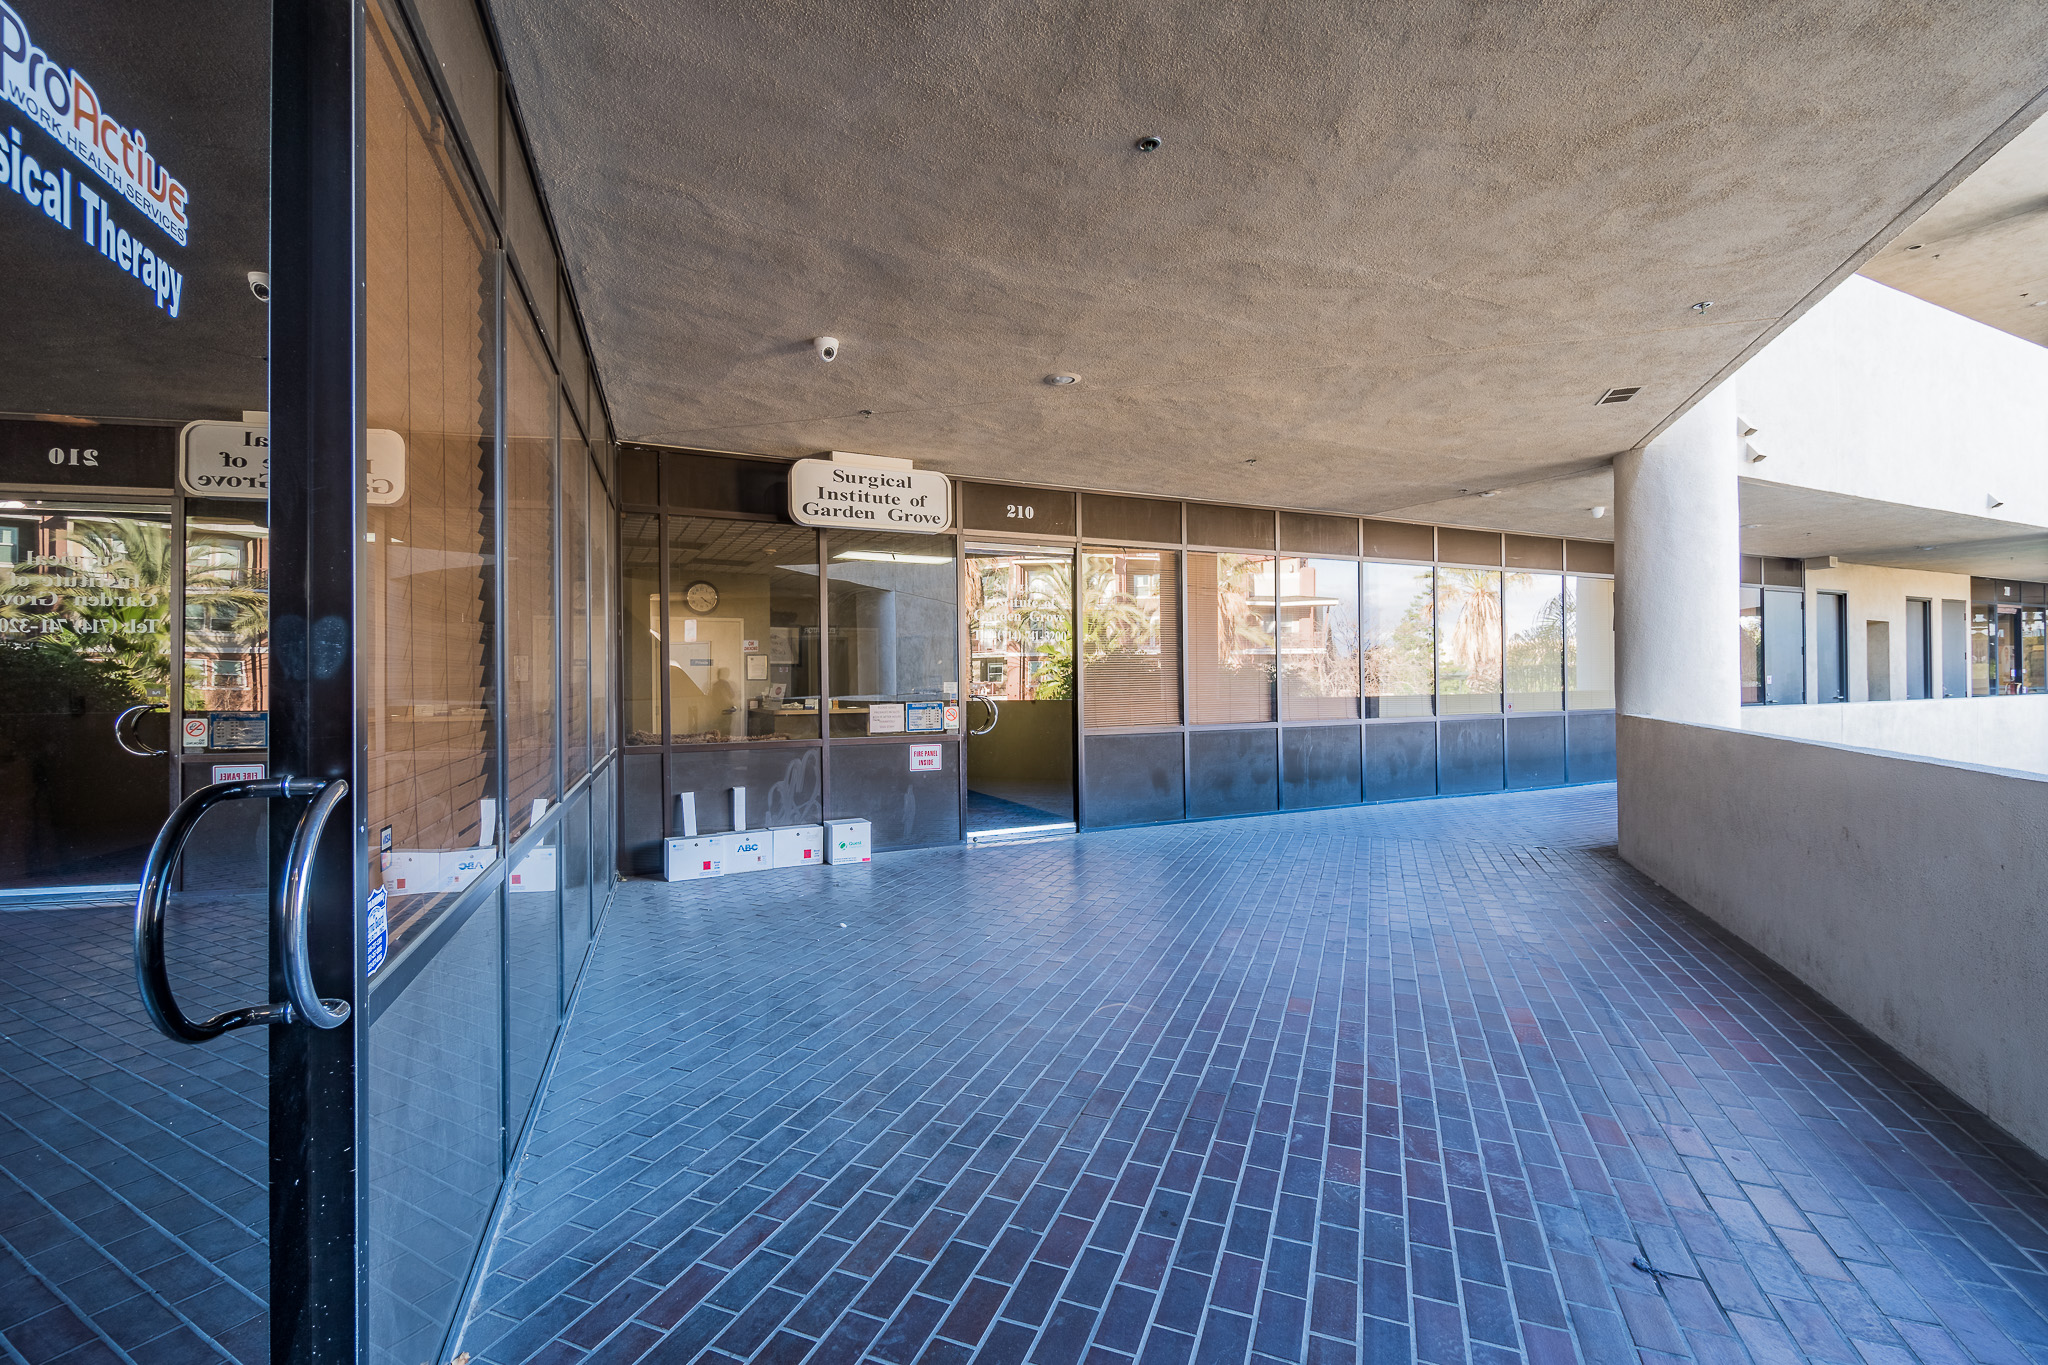 Garden Grove Medical Offices 2-3.jpg